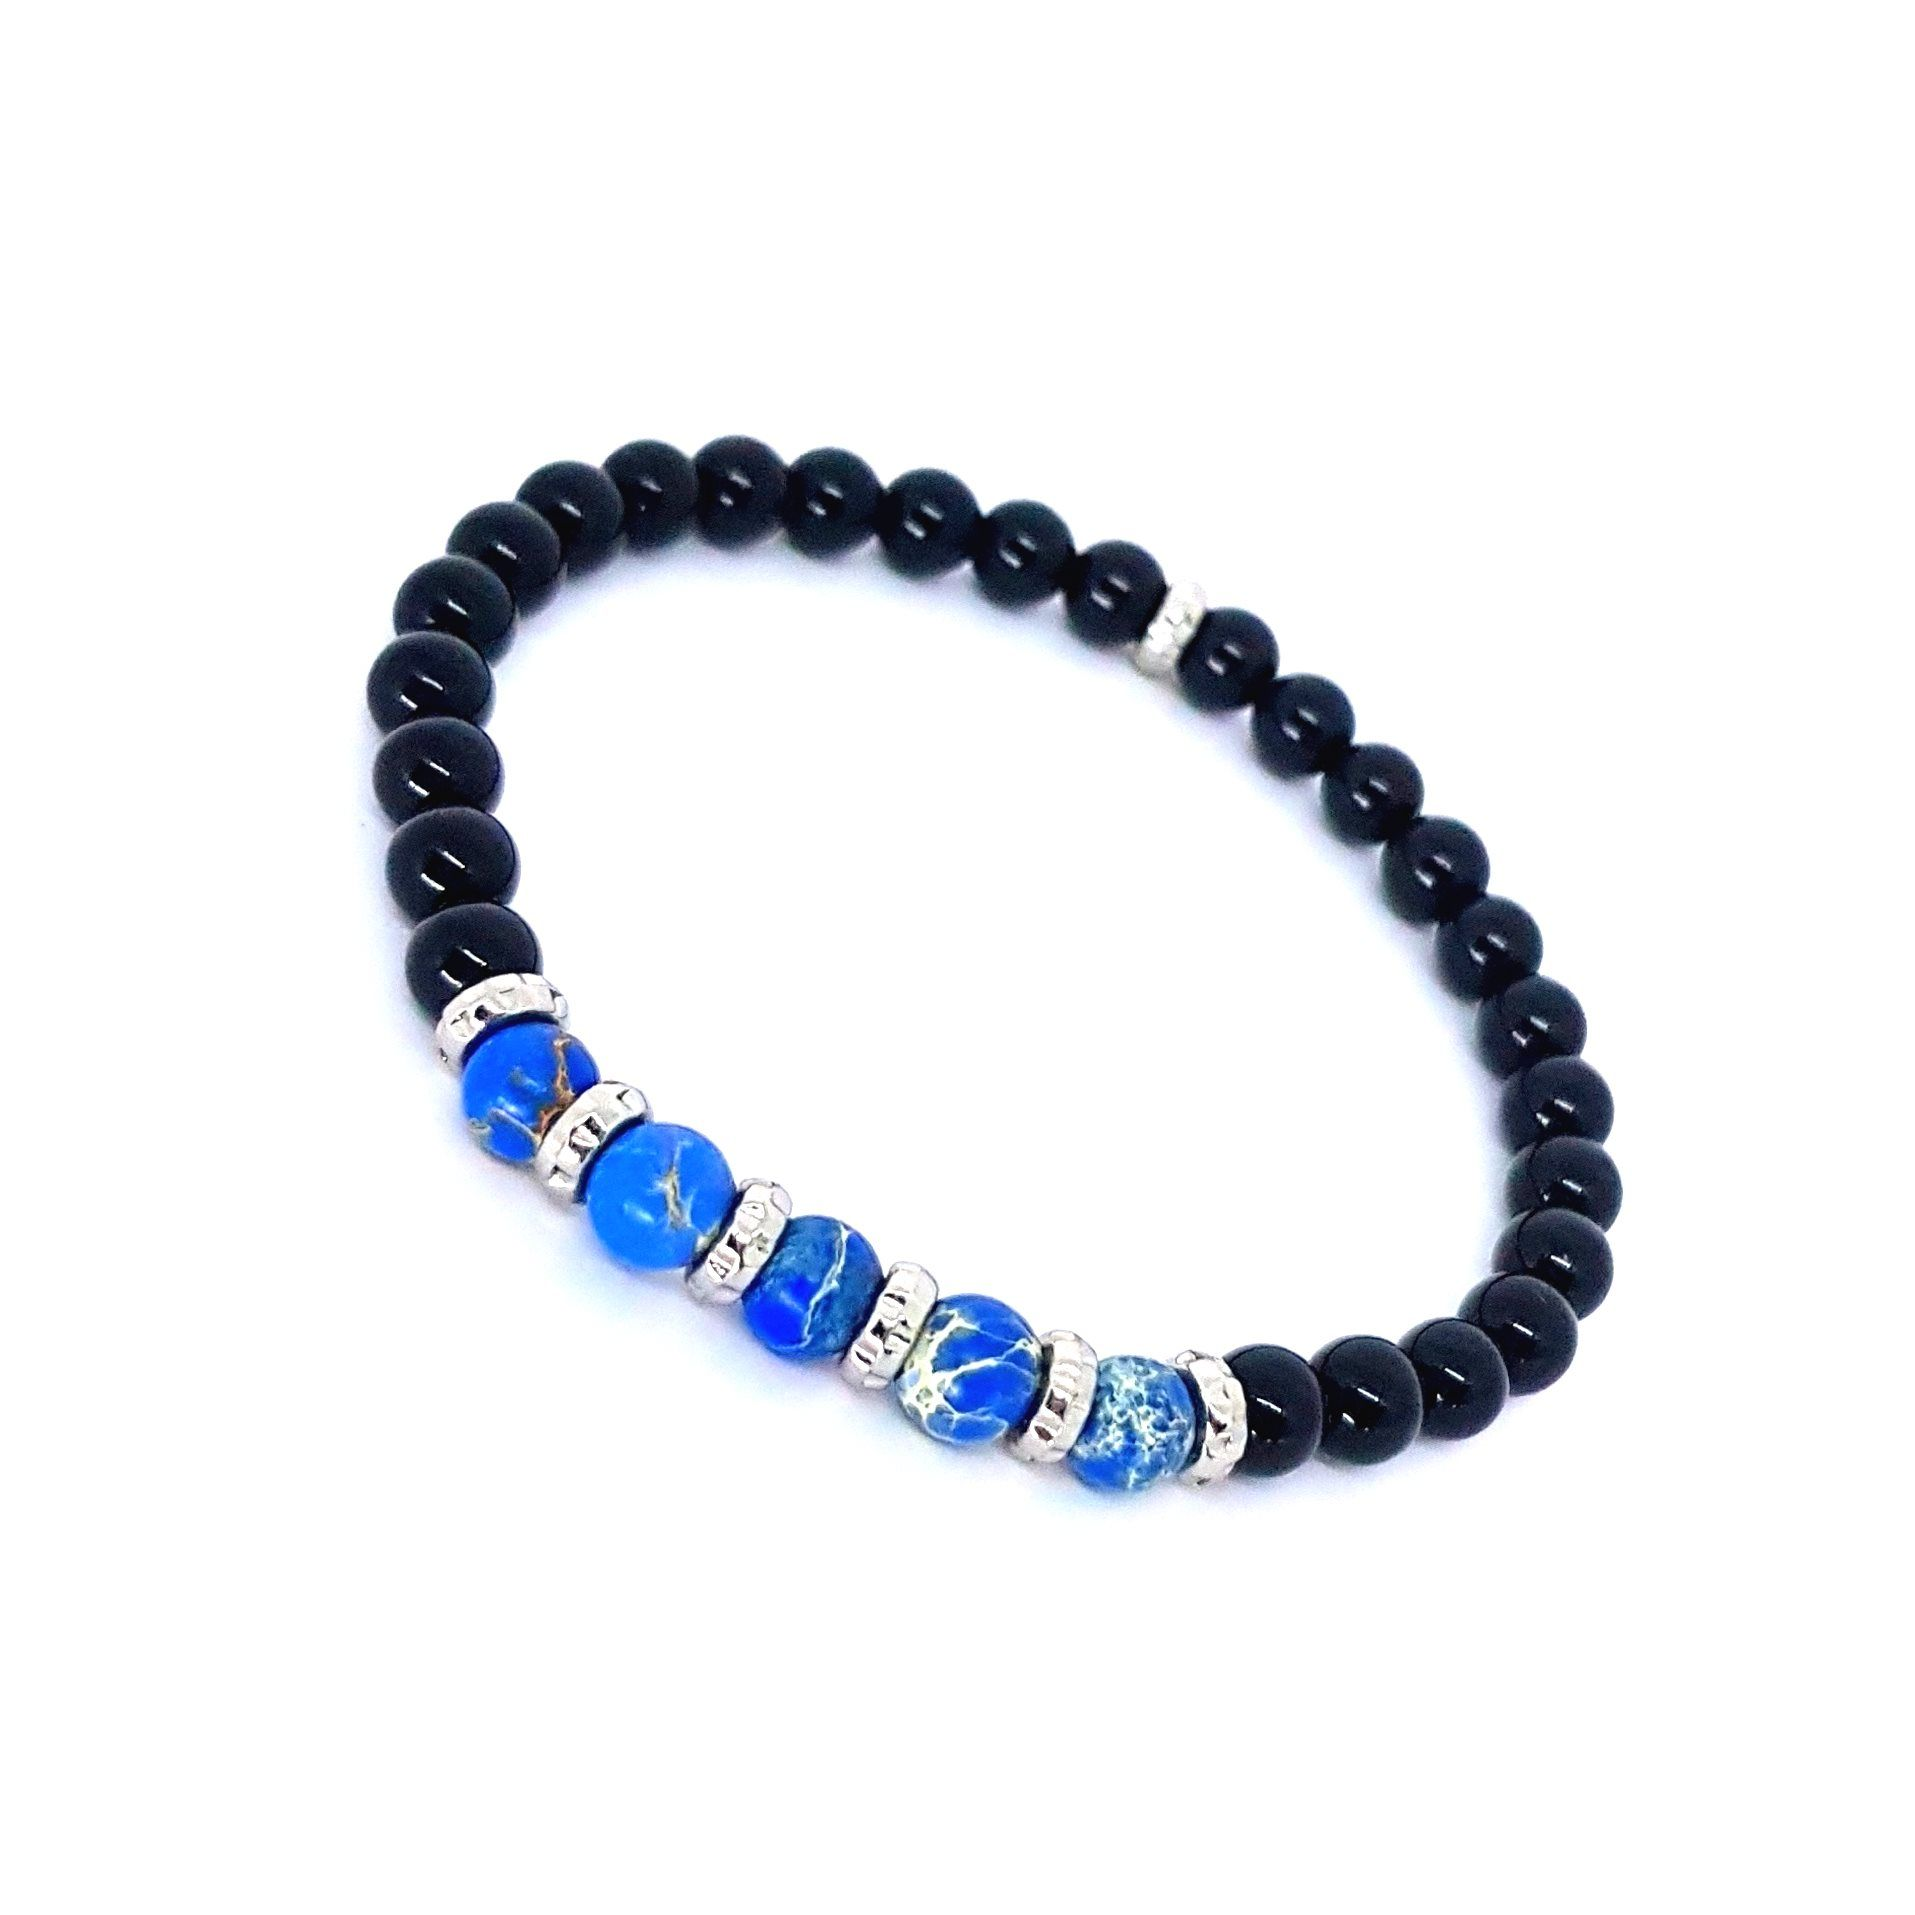 Pulseira de Pedra Onix e Jasper Azul